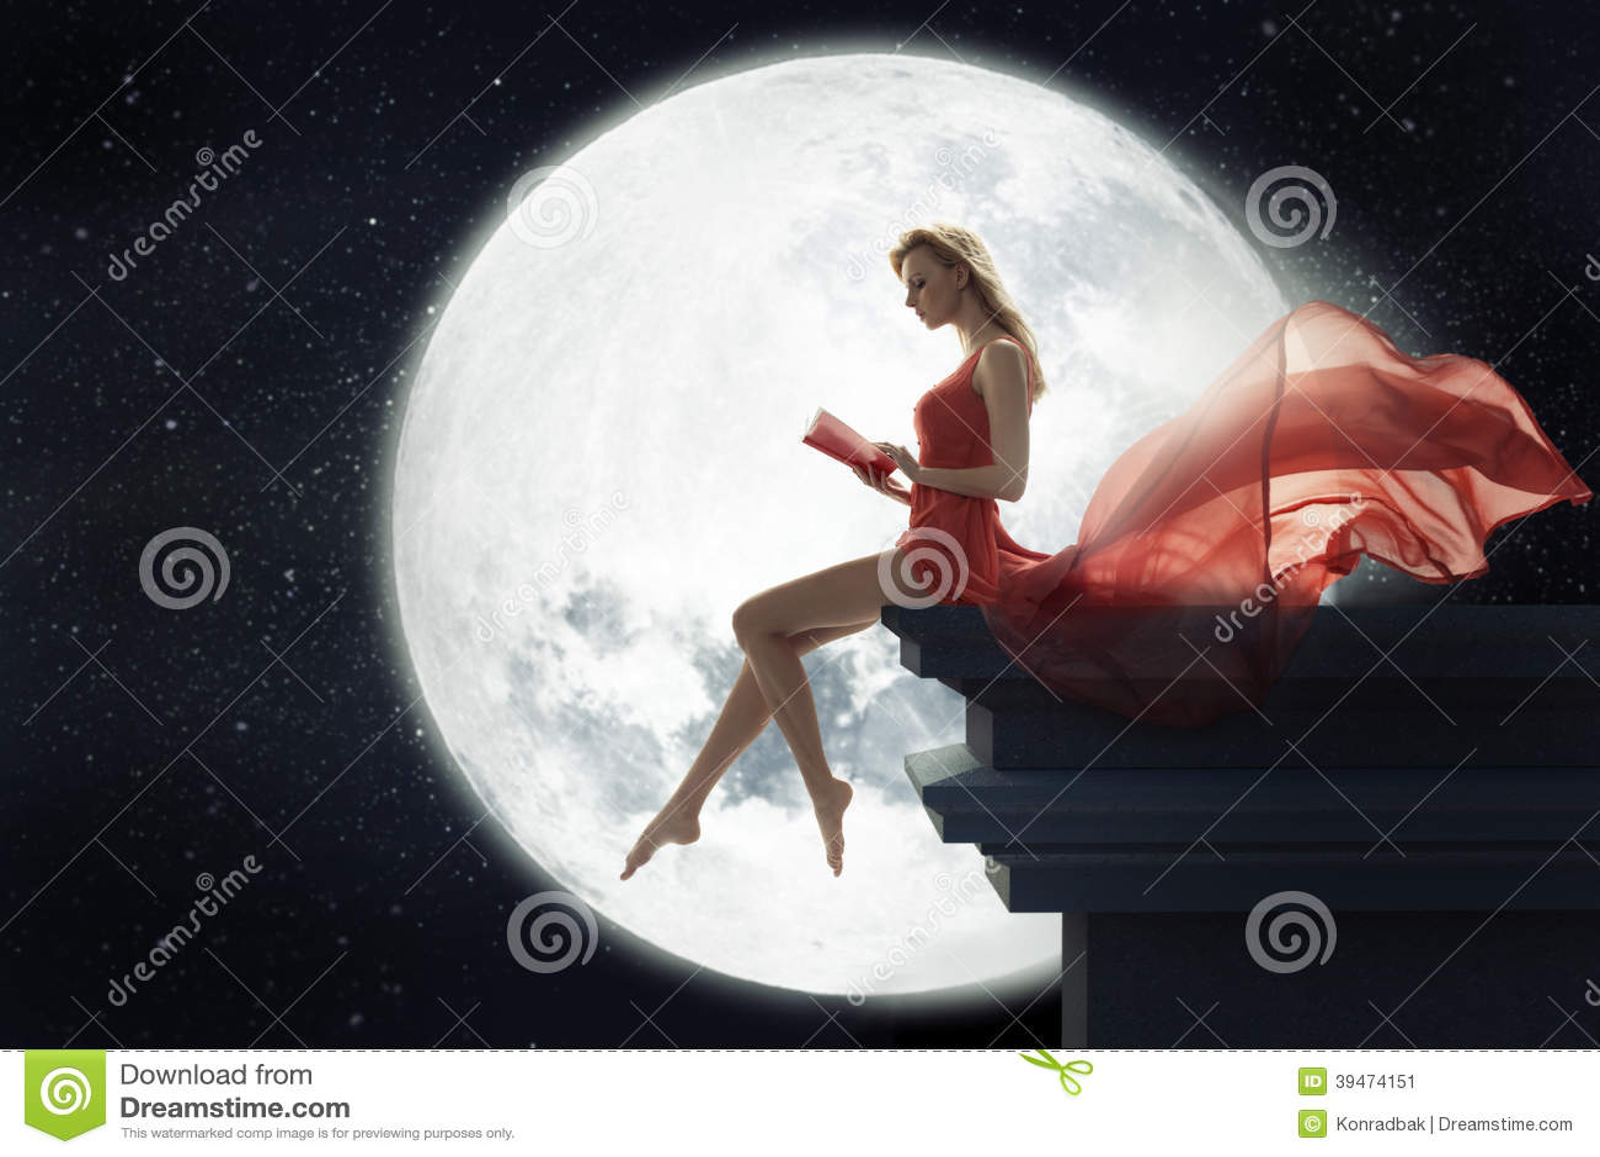 Mujer luna bella chat video - 2 7